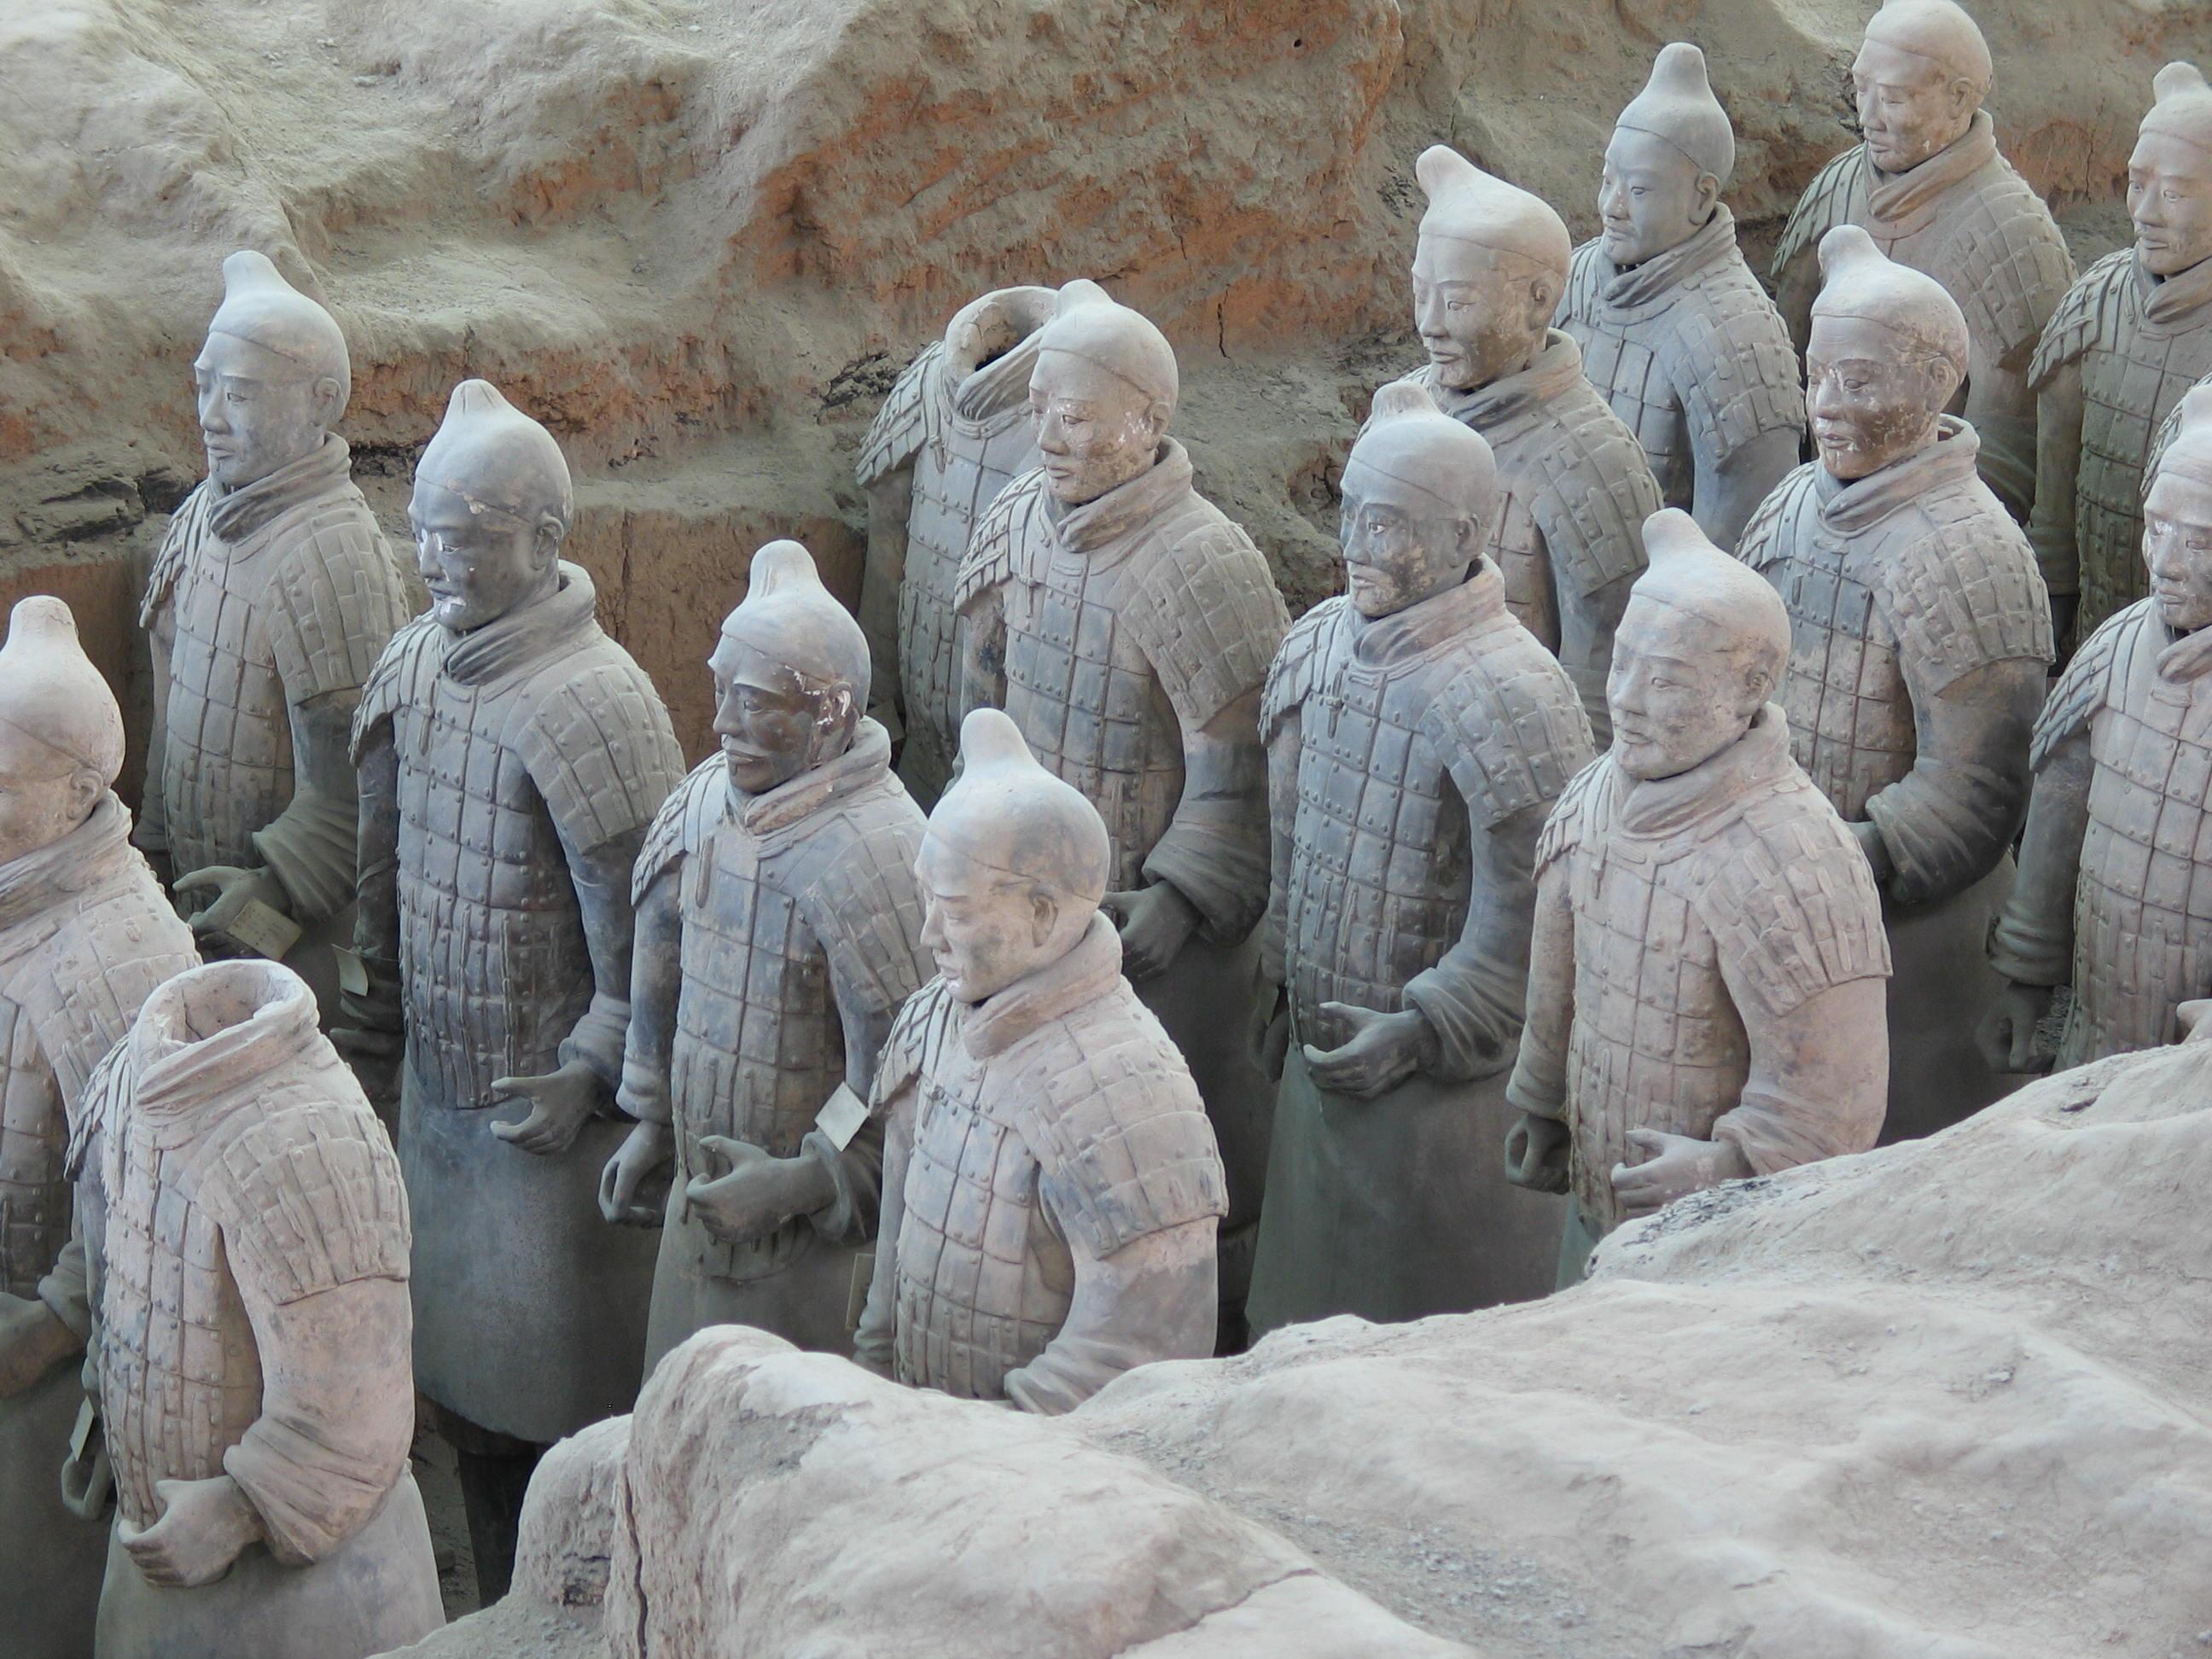 shang dynasty major accomplishments